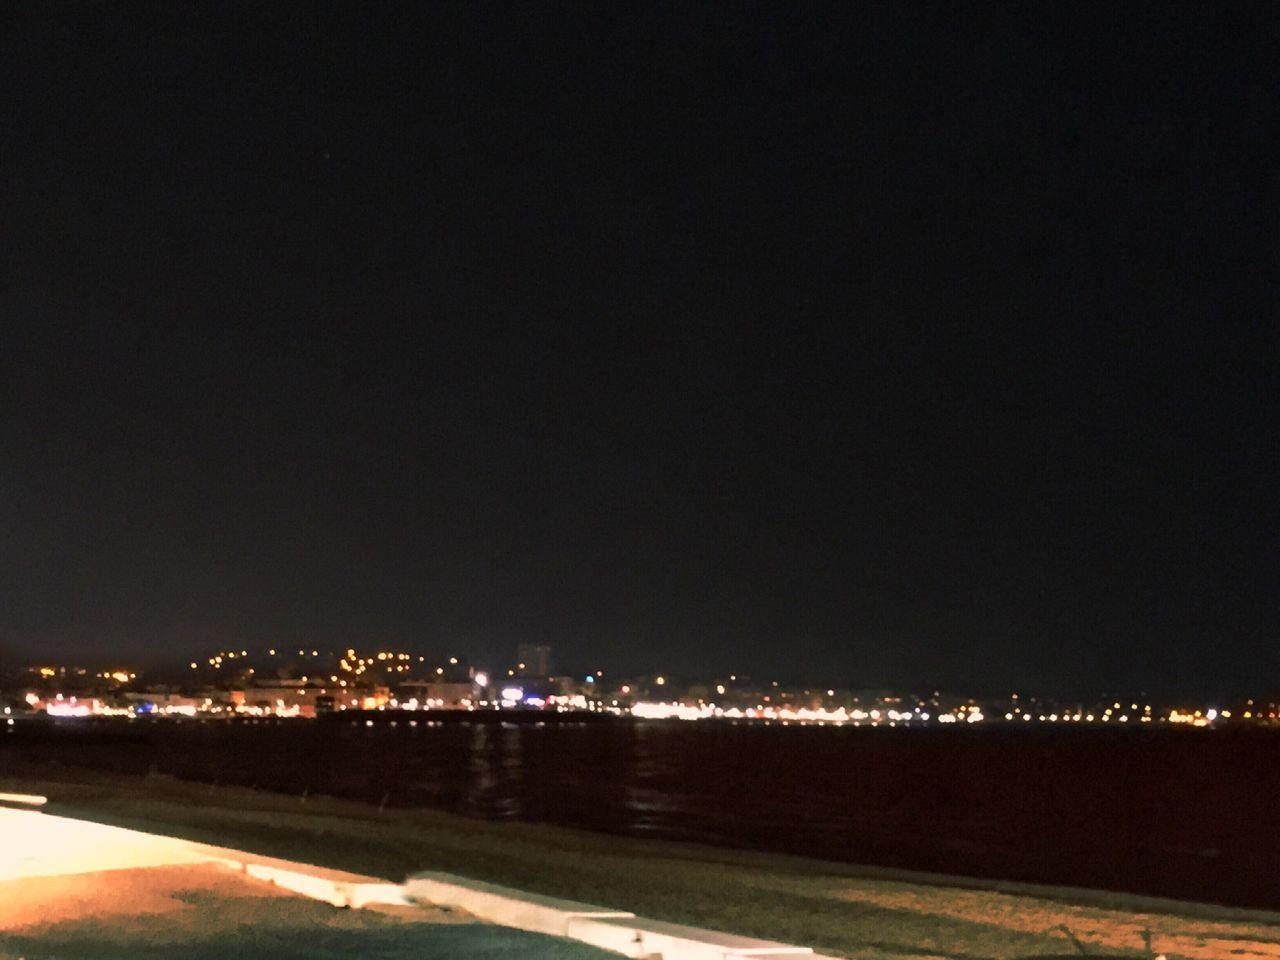 Night Nuit Saint Raphael Au Bord De Mer Bord De Mer Méditerranée Côte D'Azur Mer Mediterranée Ville City